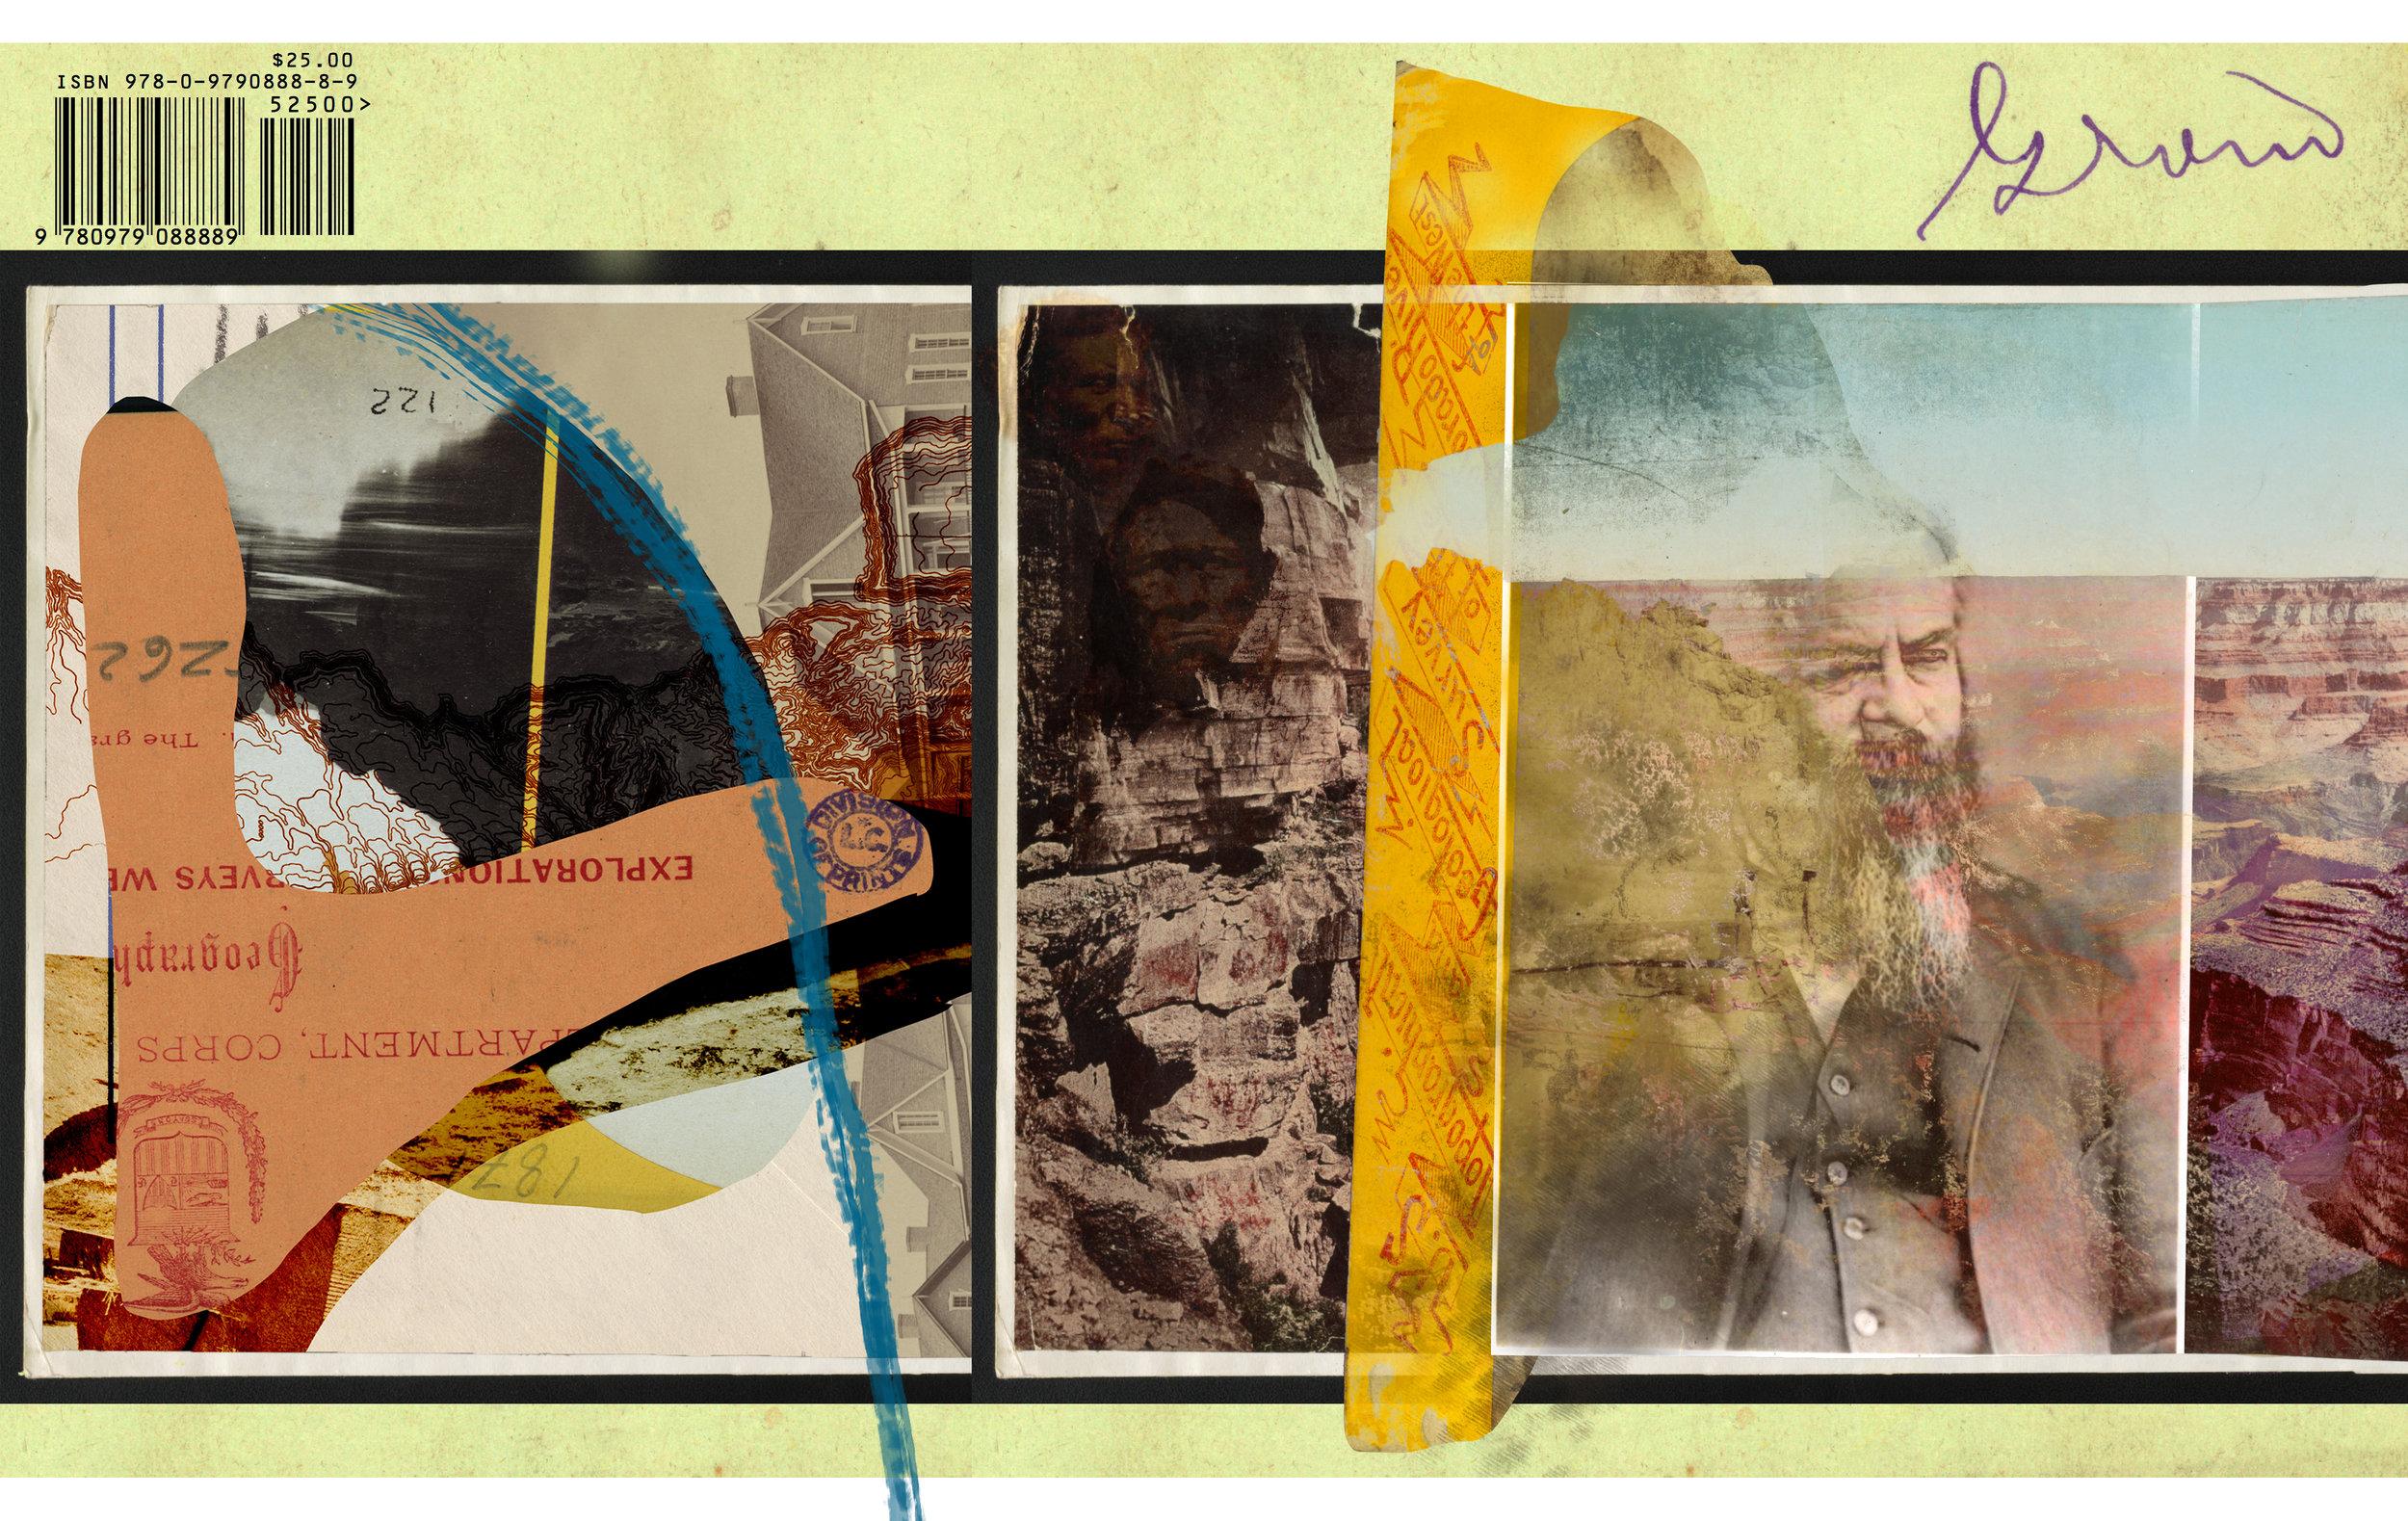 Canyons - Matthew Klane and James Belflower